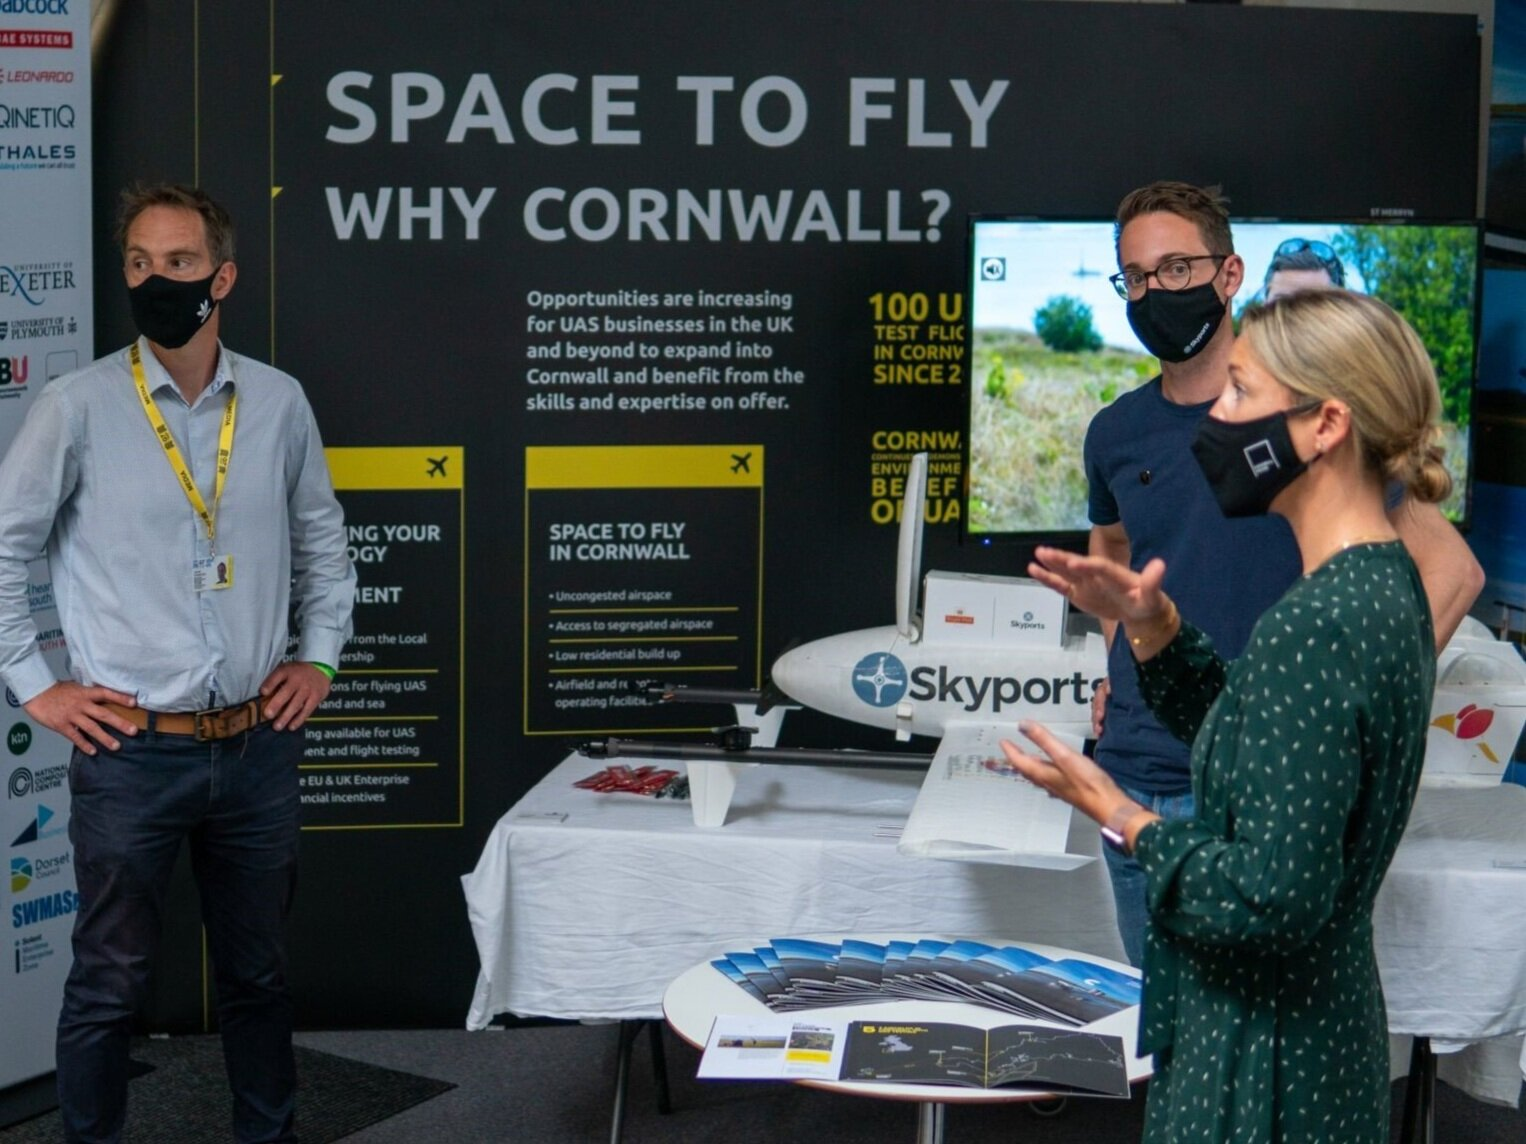 DronePrep attends G7 Technology Showcase